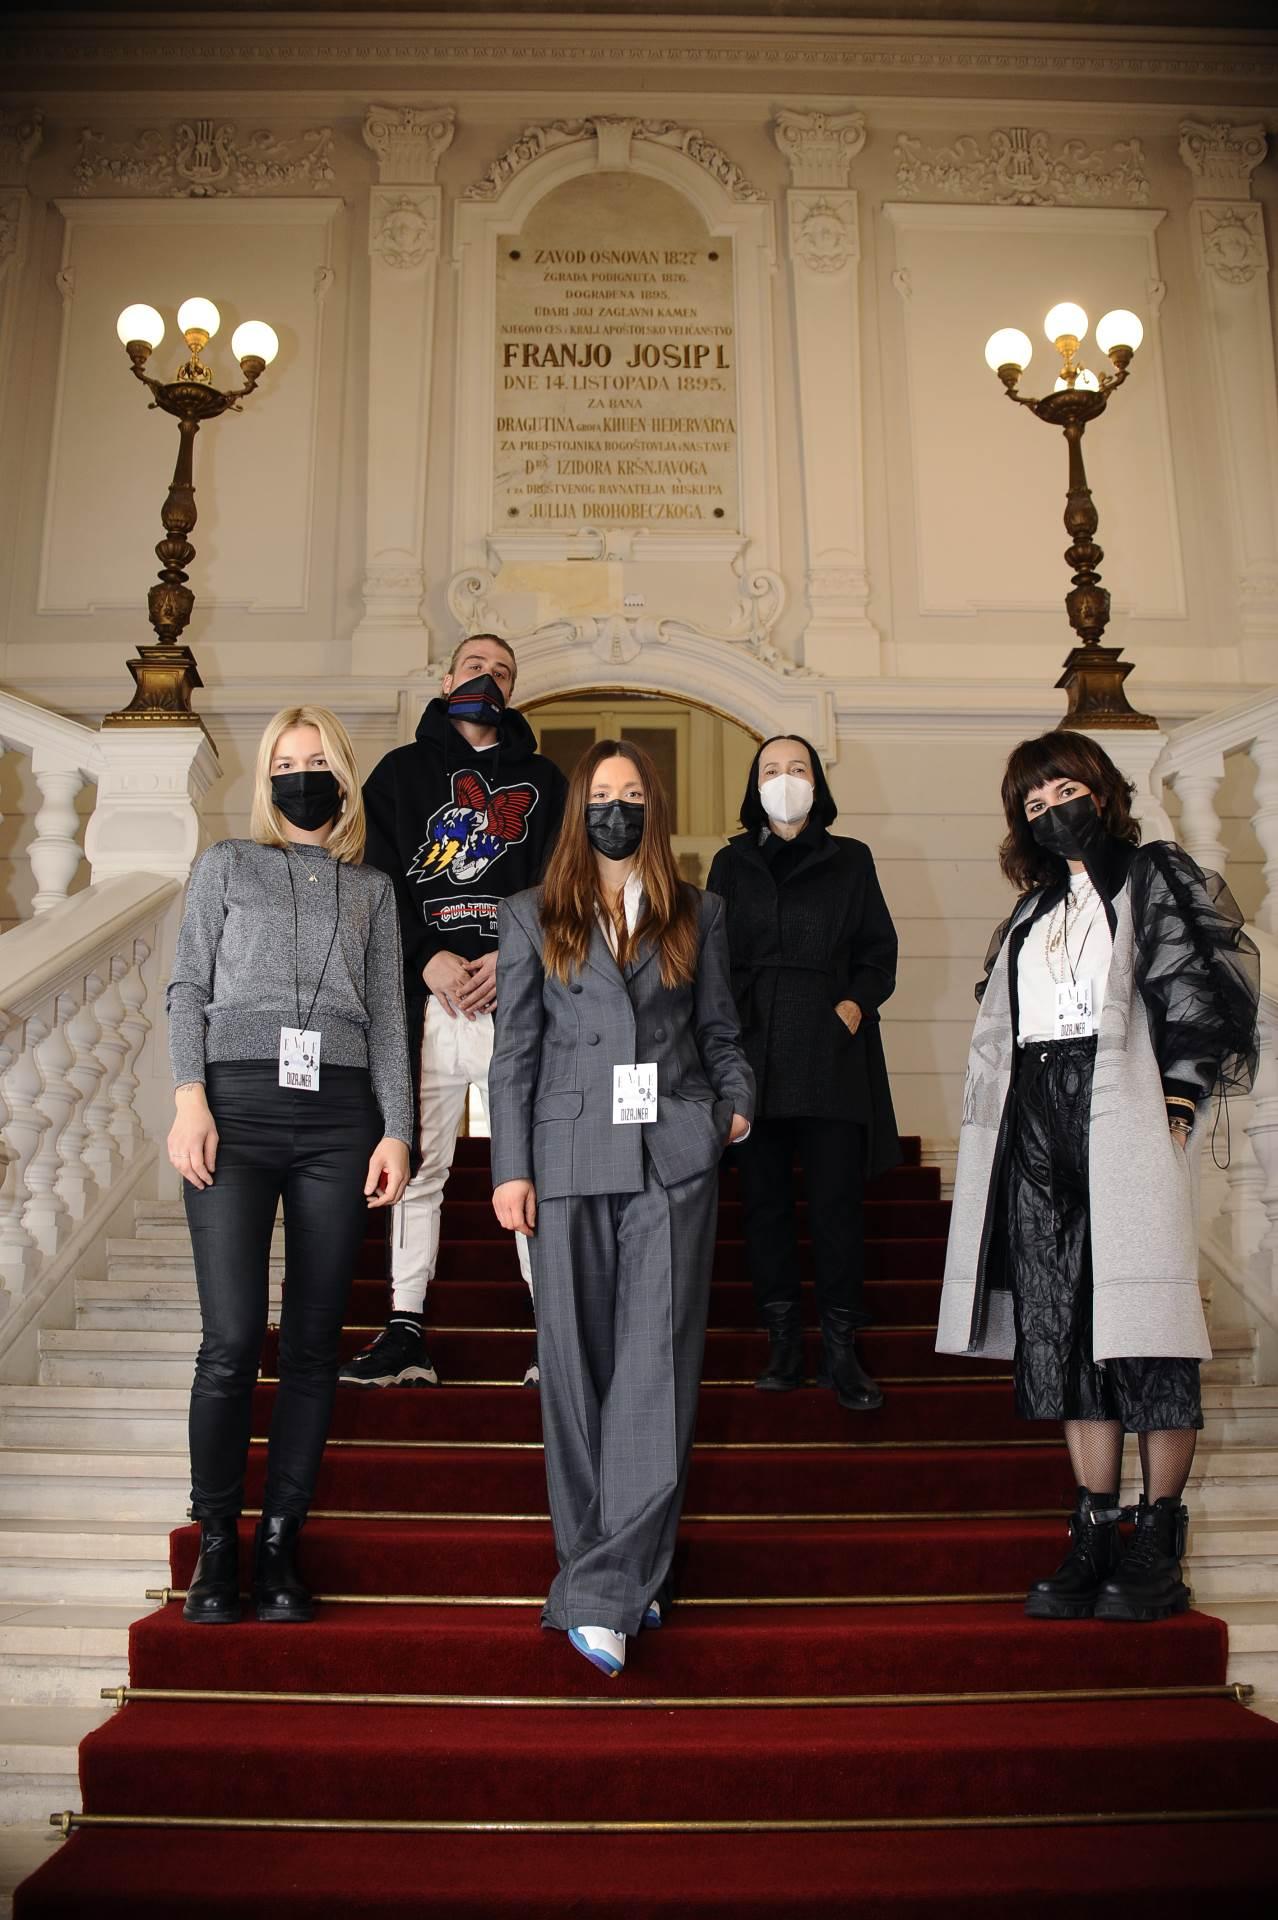 Dizajneri Maja Miletić, Lovro Krčar, Branka Donassy, Lana Puljić i Ogi Antunac